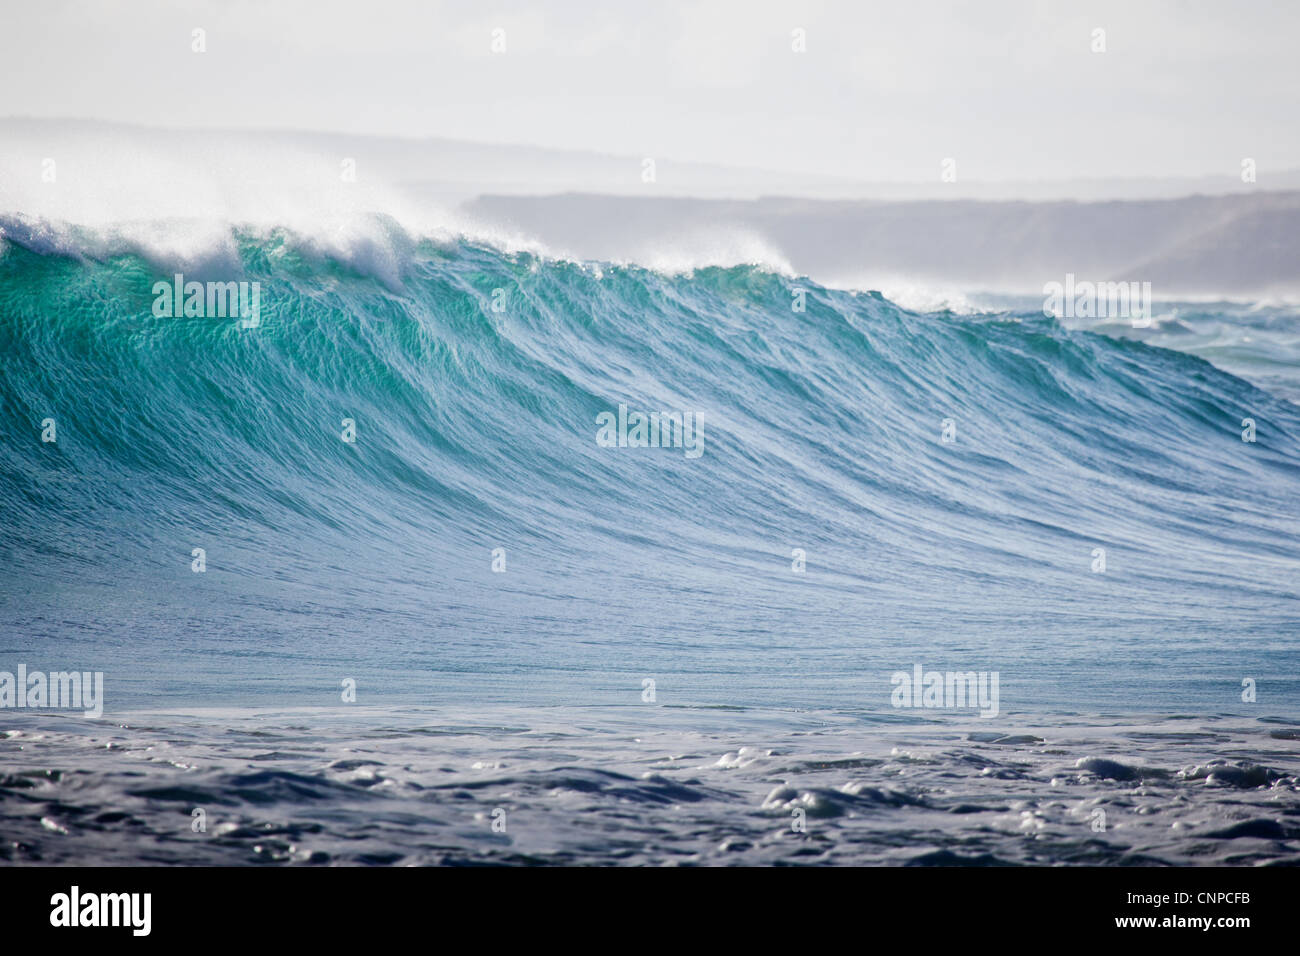 Rottura d'onda a Greenly Beach South Australia Immagini Stock